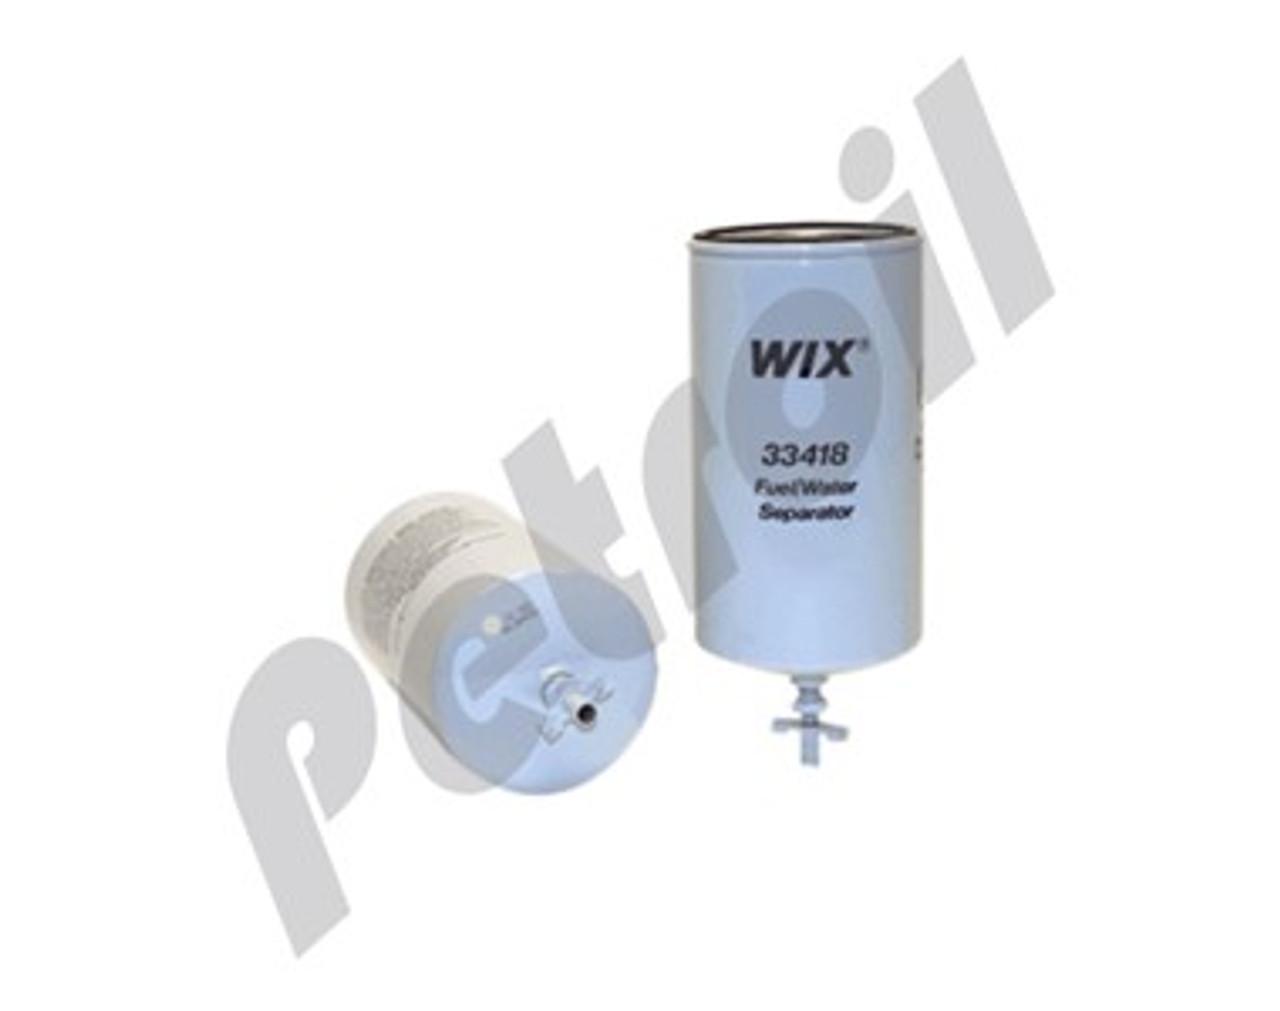 Wix Fuel Filter Water Separator Volvo Trucks Model Wi Motor